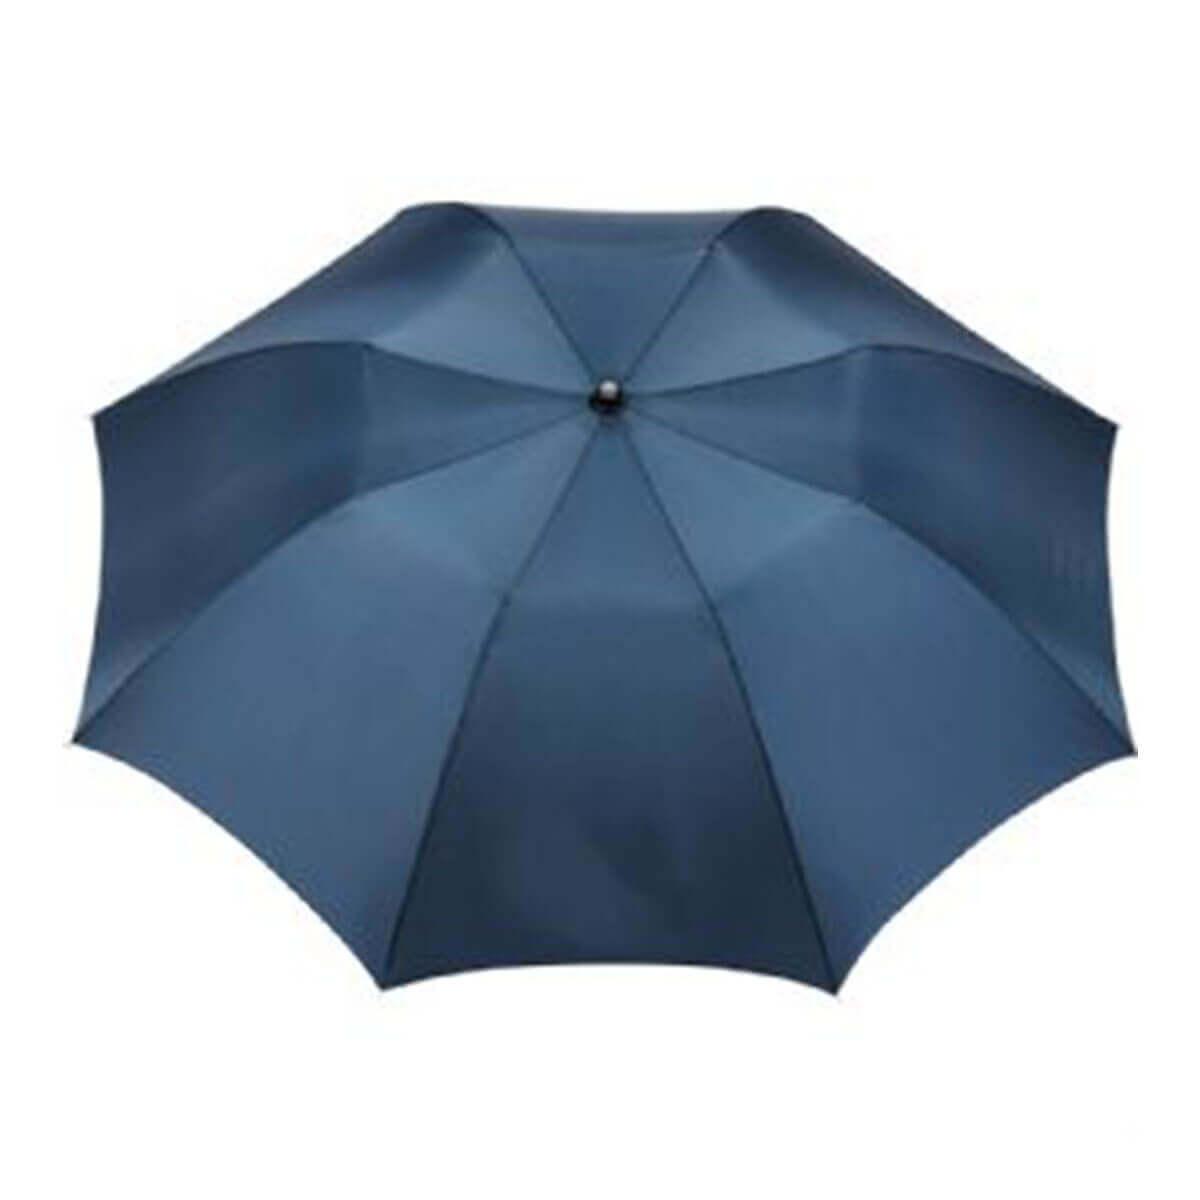 Stromberg Fold Auto Umbrella-Navy